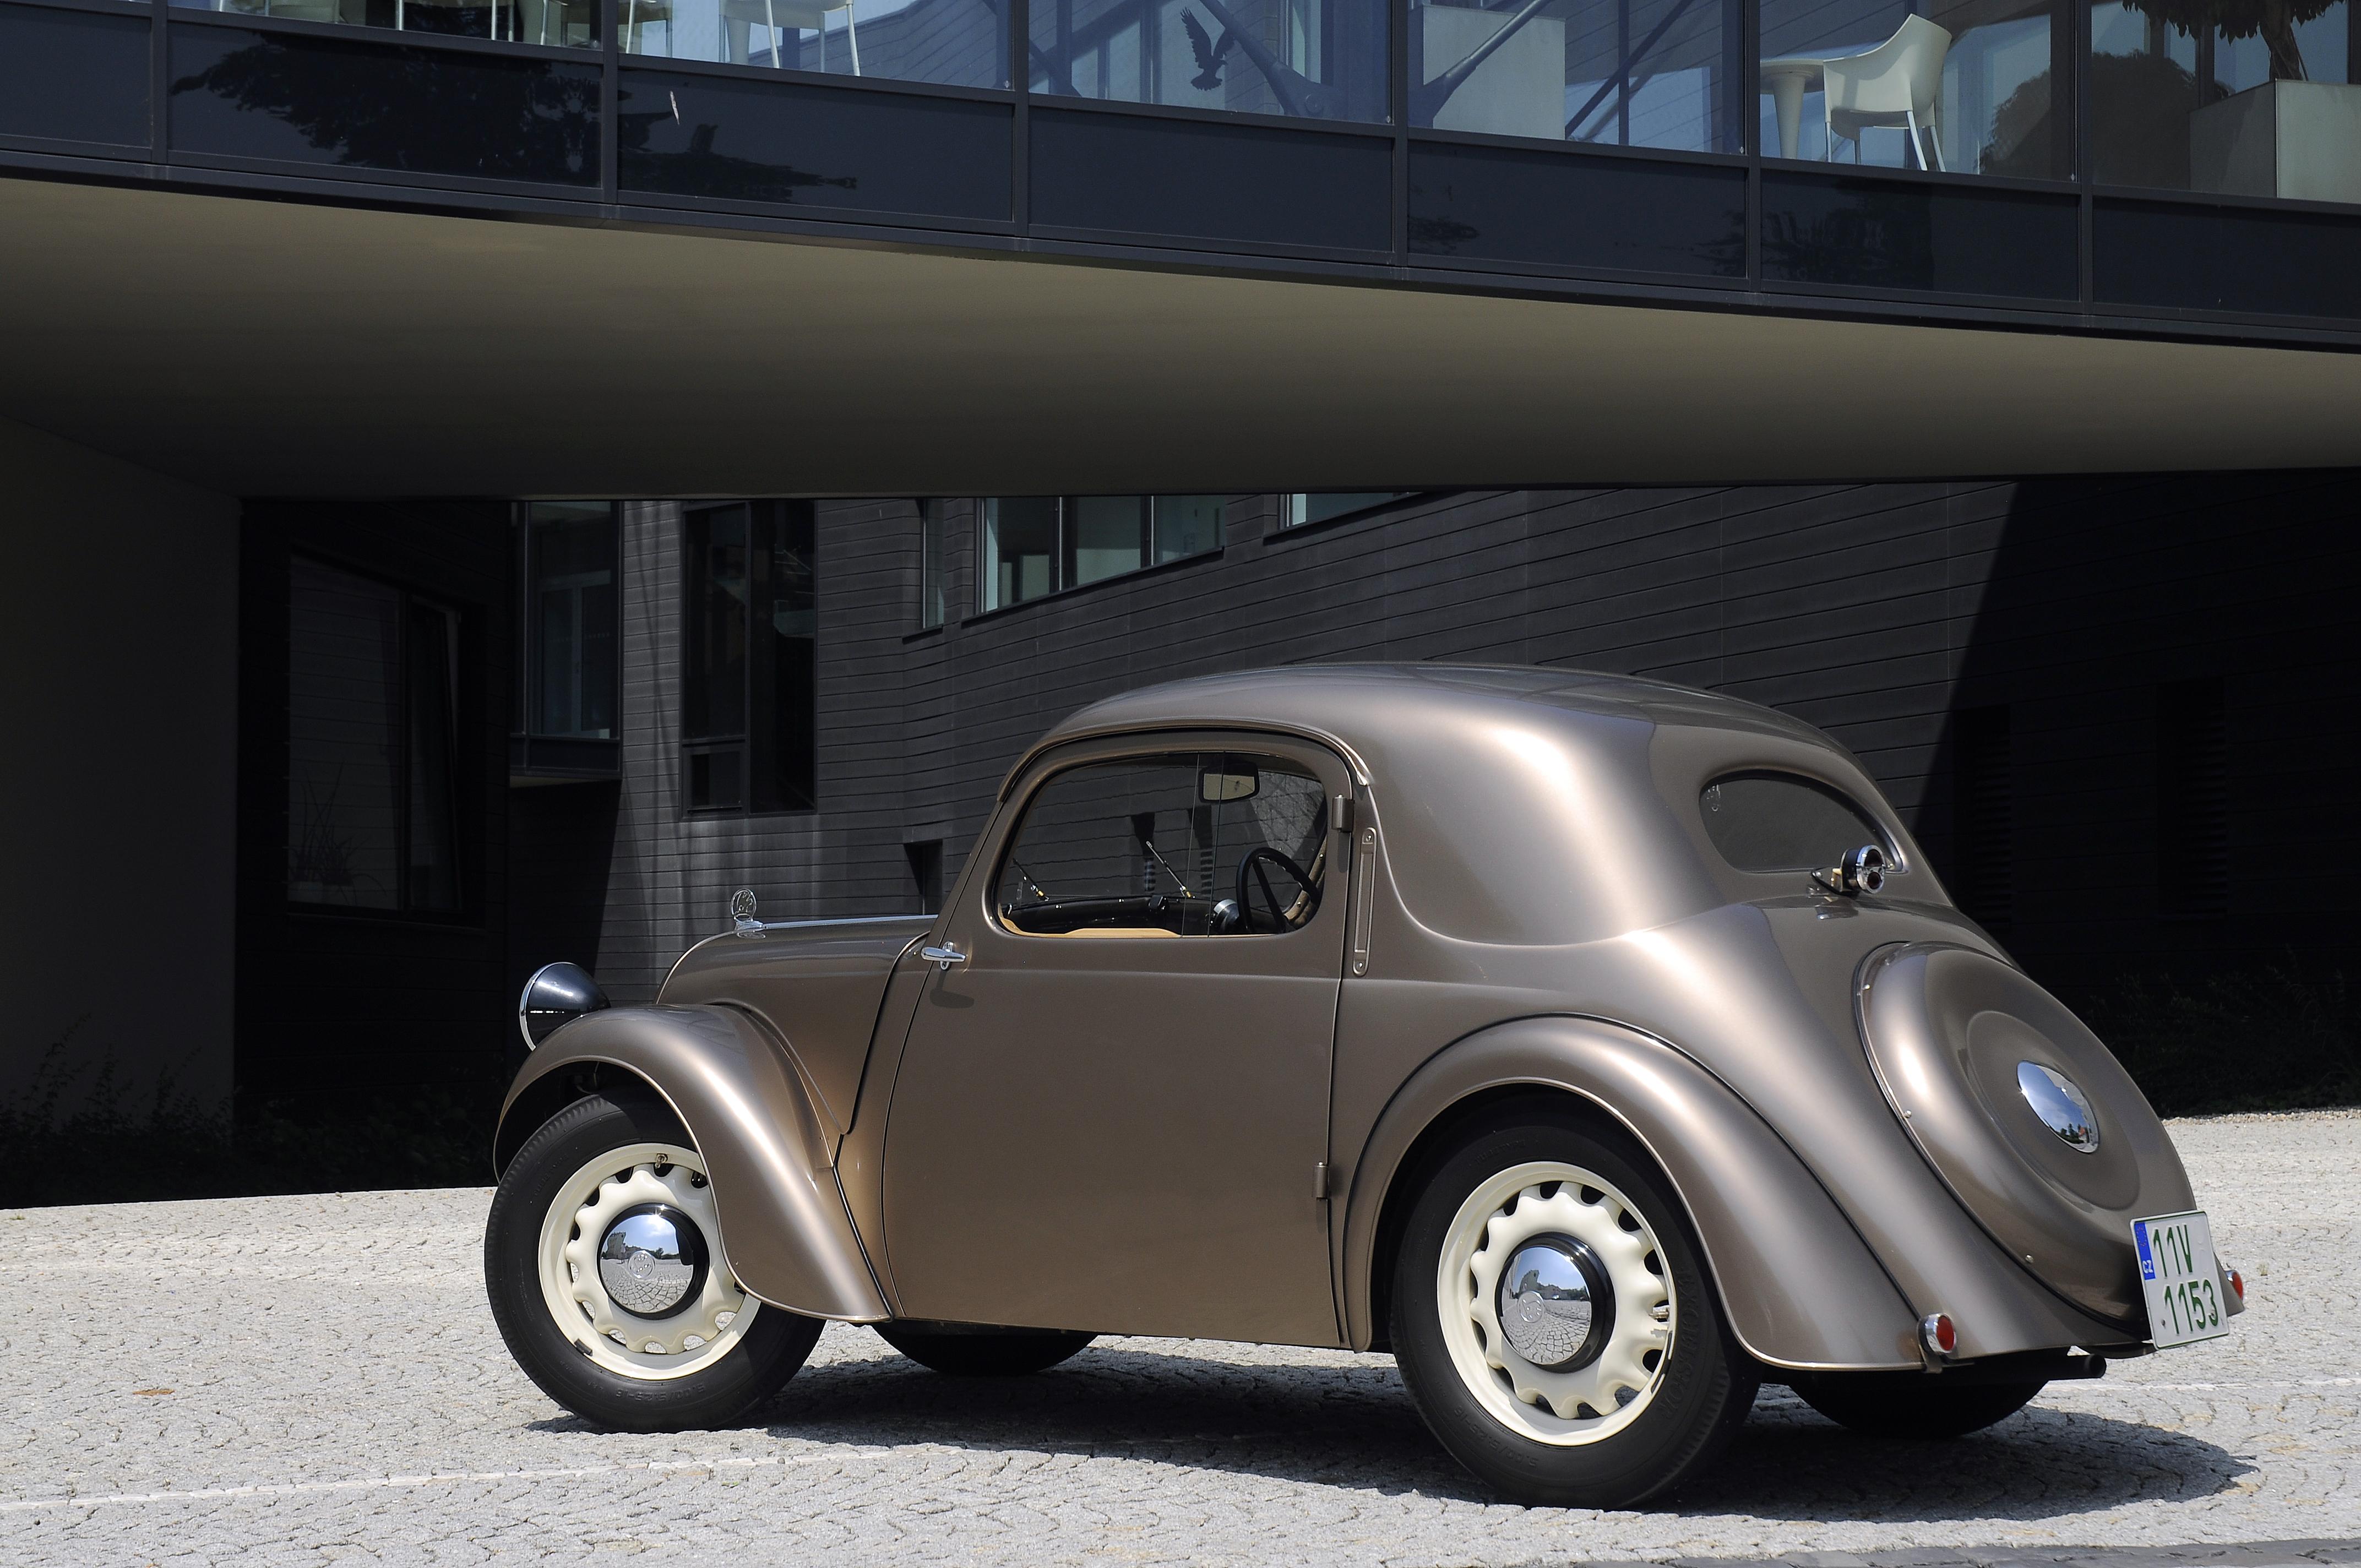 Lesser-known models from SKODA AUTO's 125-year history: The SKODA SAGITTA - Image 2